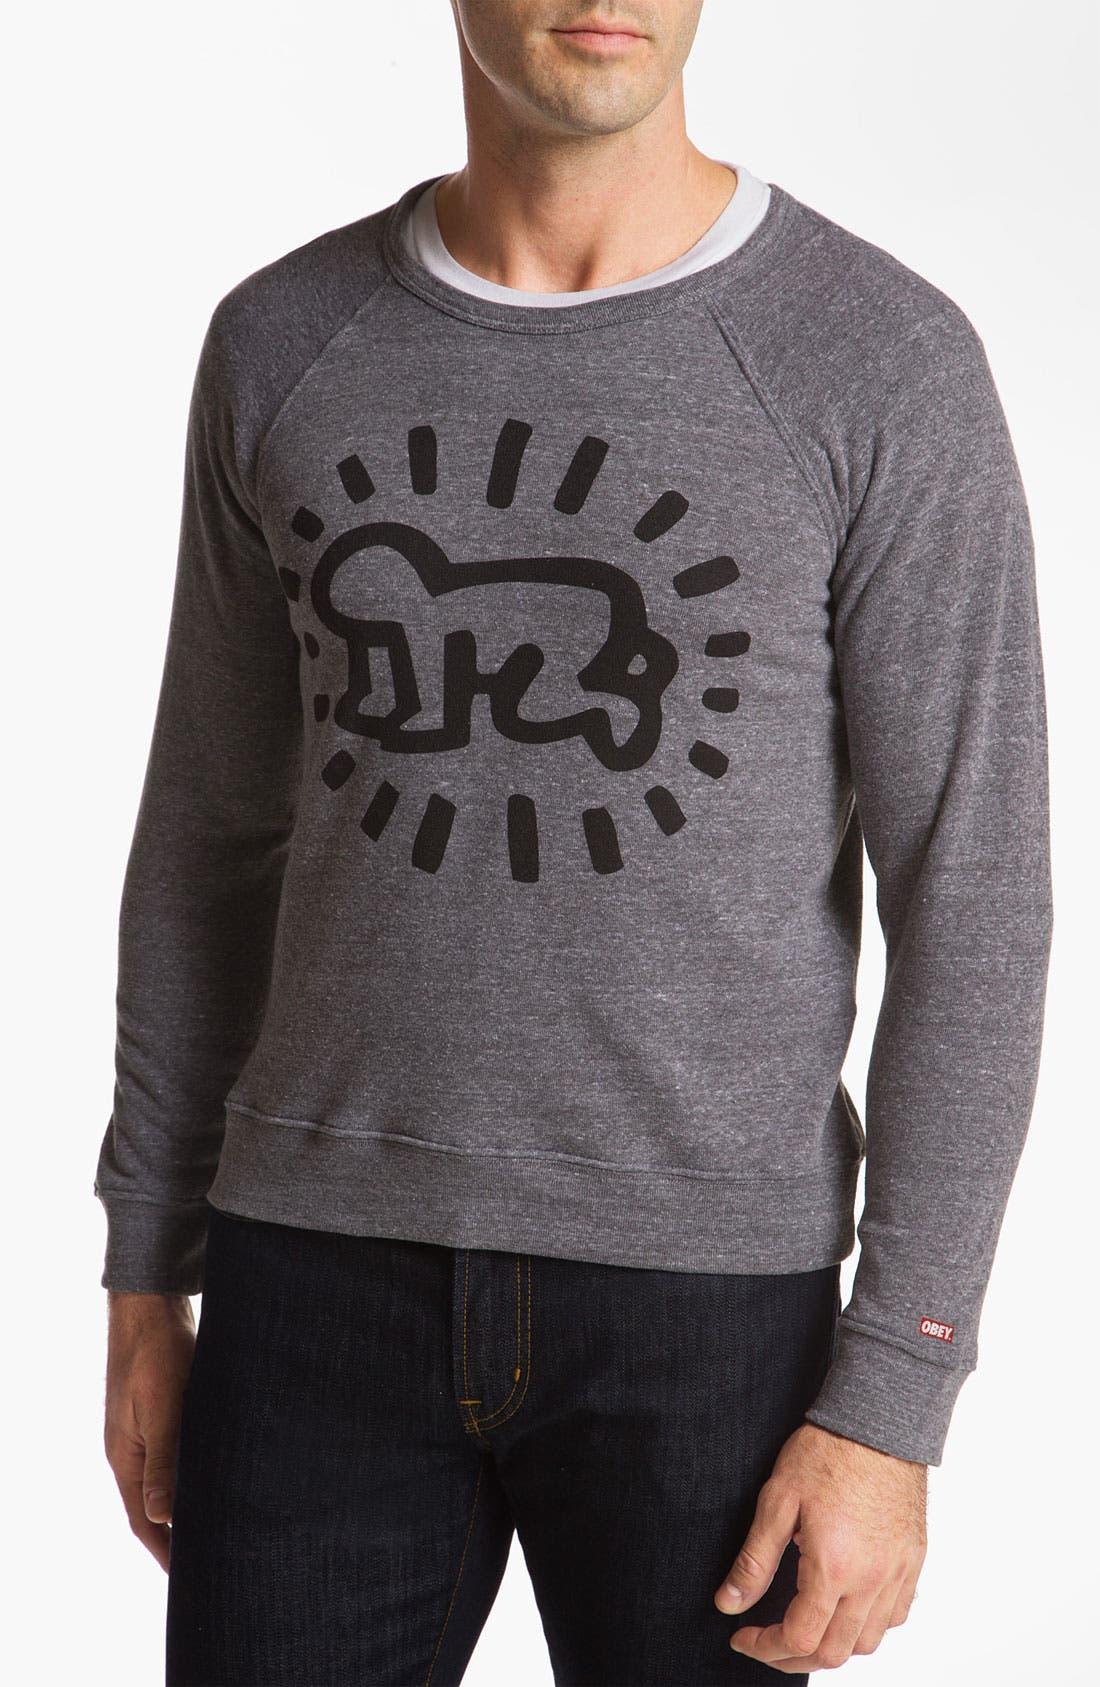 Main Image - Obey 'Keith Haring Baby' Crewneck Sweatshirt